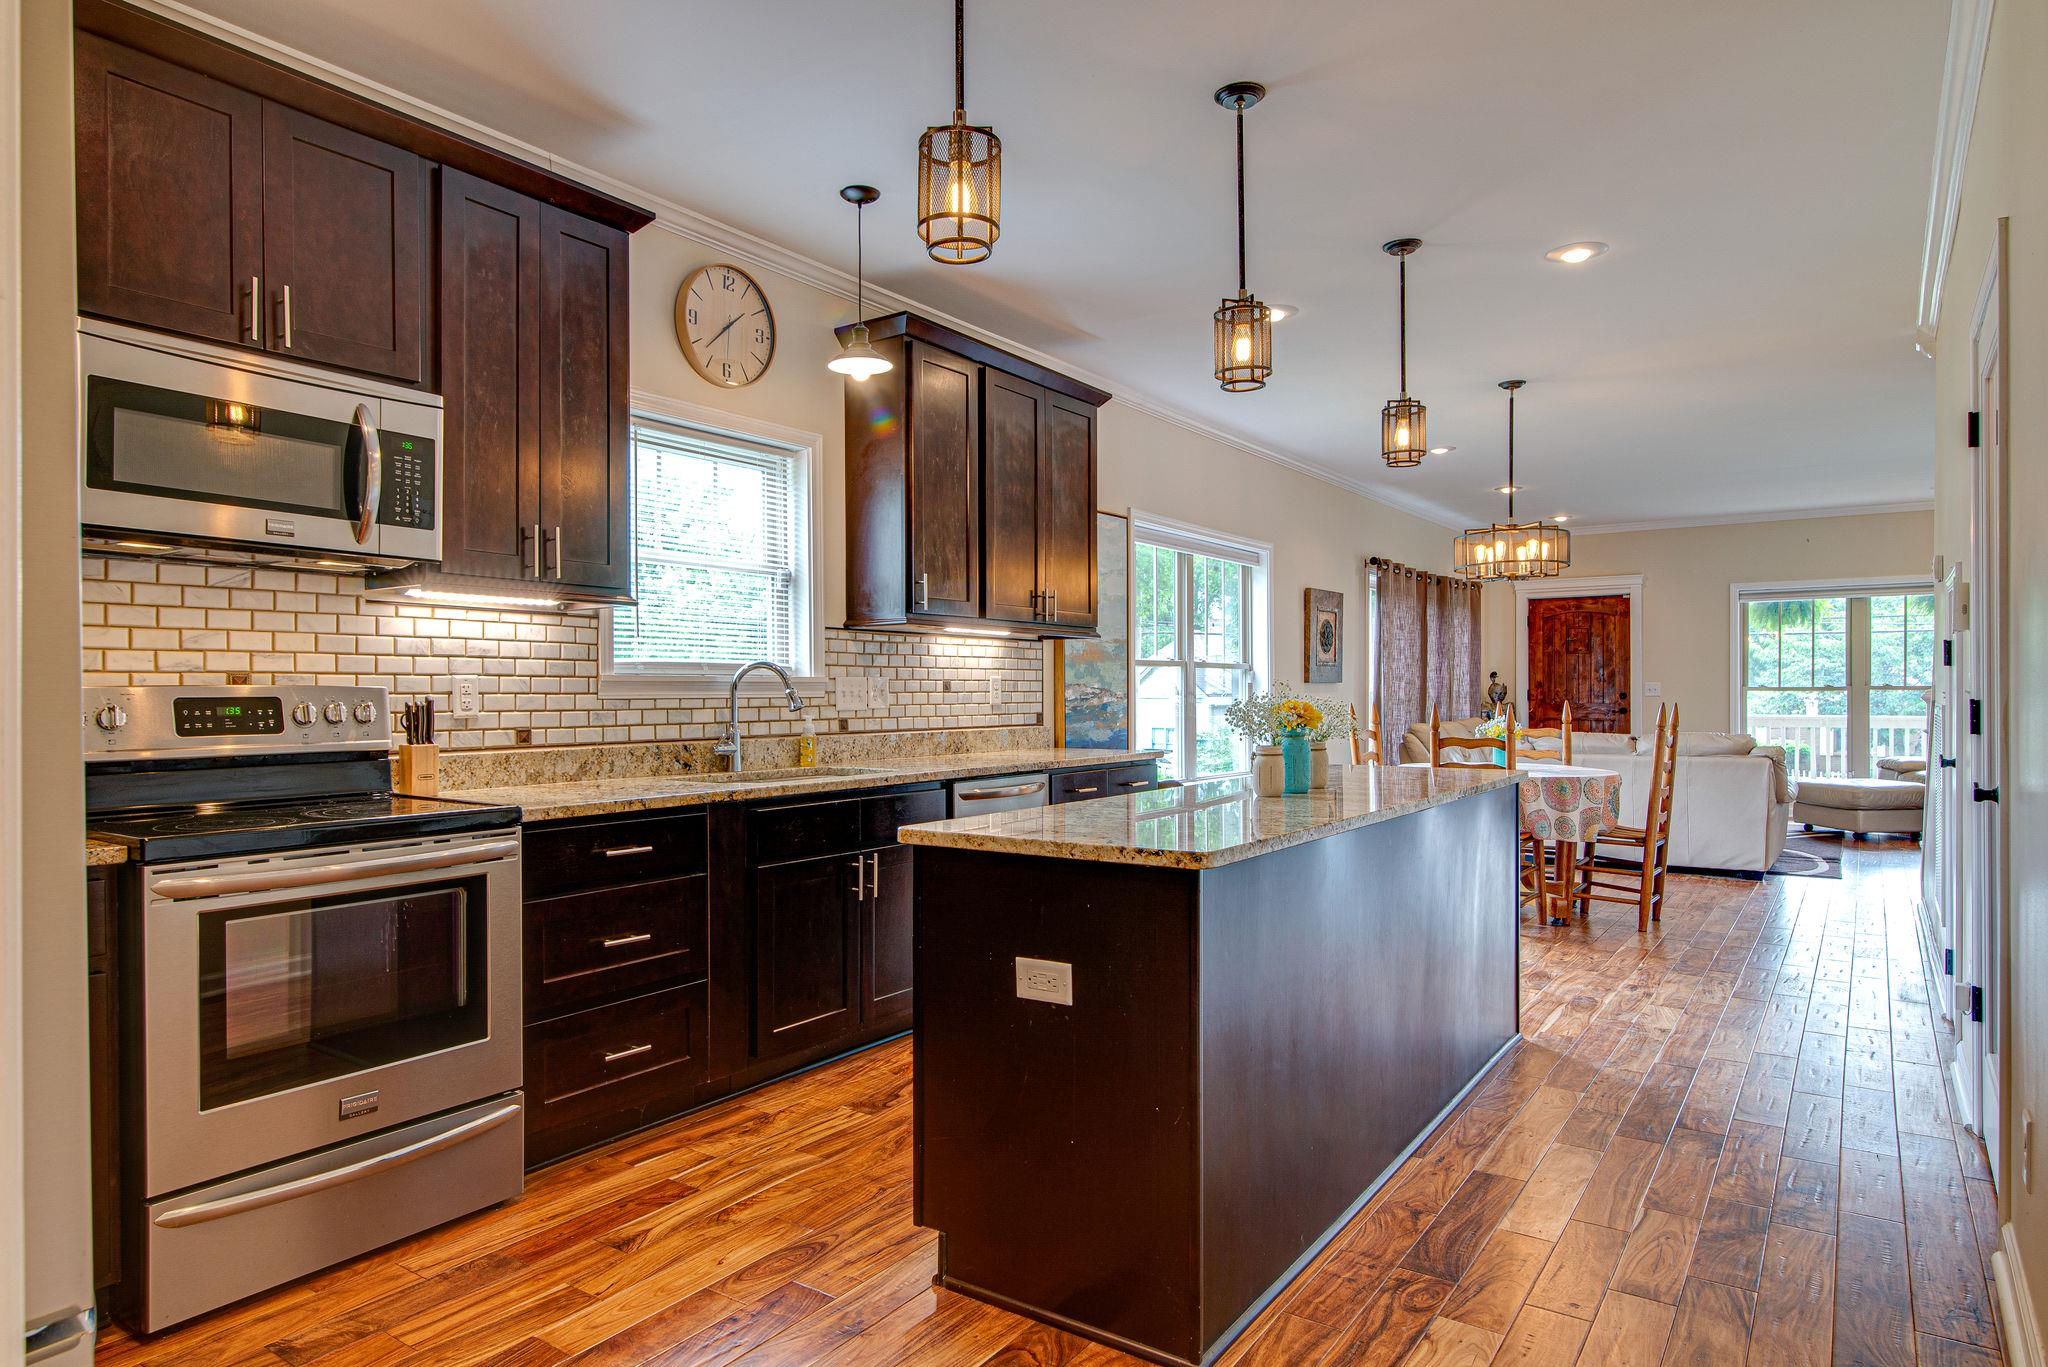 1009A N 5Th St, Nashville, TN 37207 - Nashville, TN real estate listing